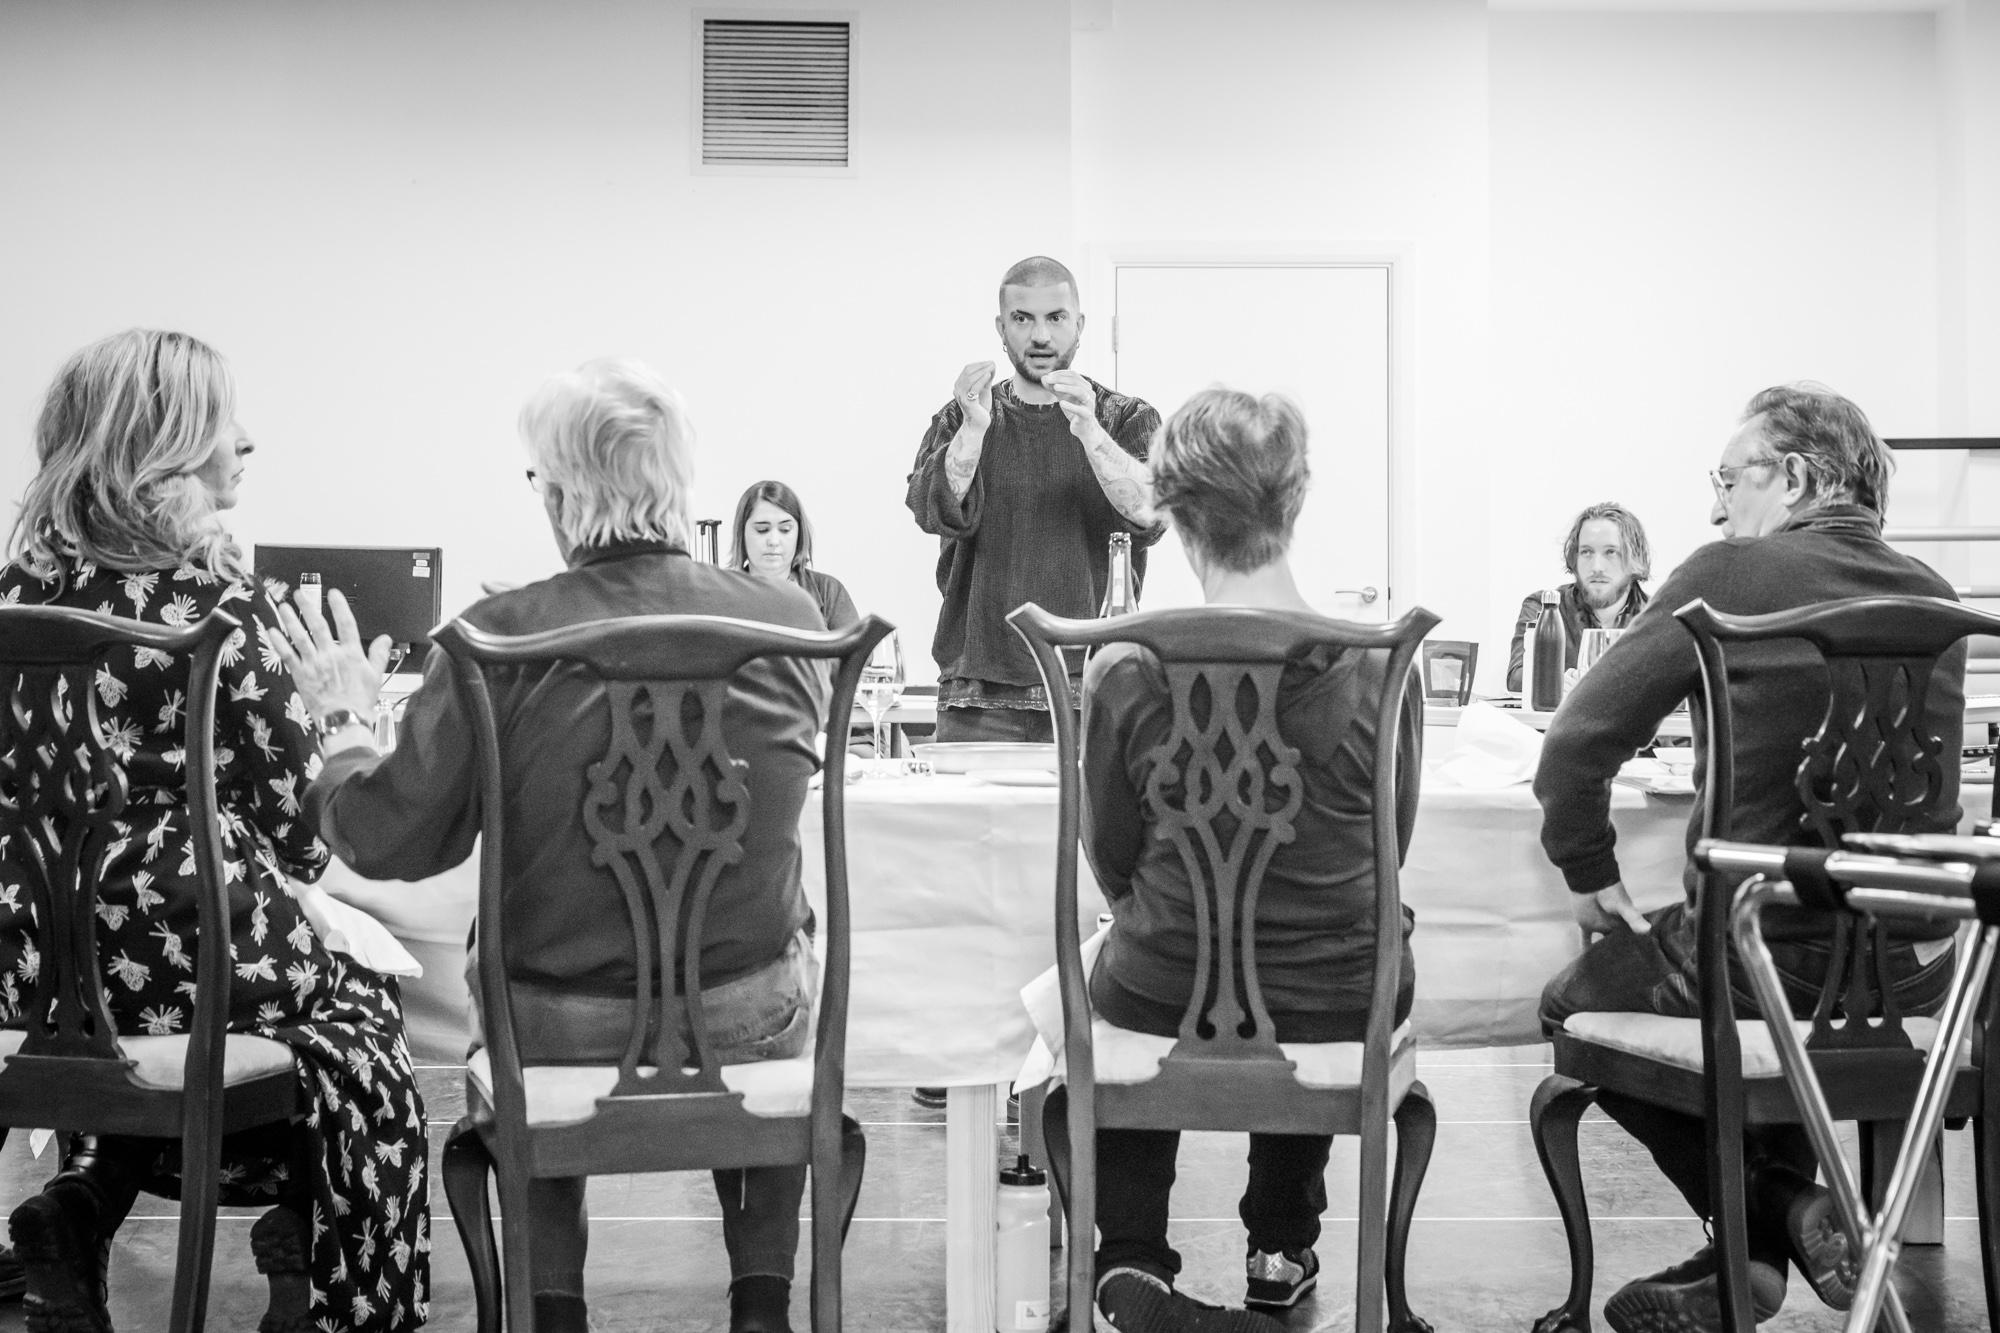 Celebration • Harold Pinter Theatre • Dir. Jamie Lloyd